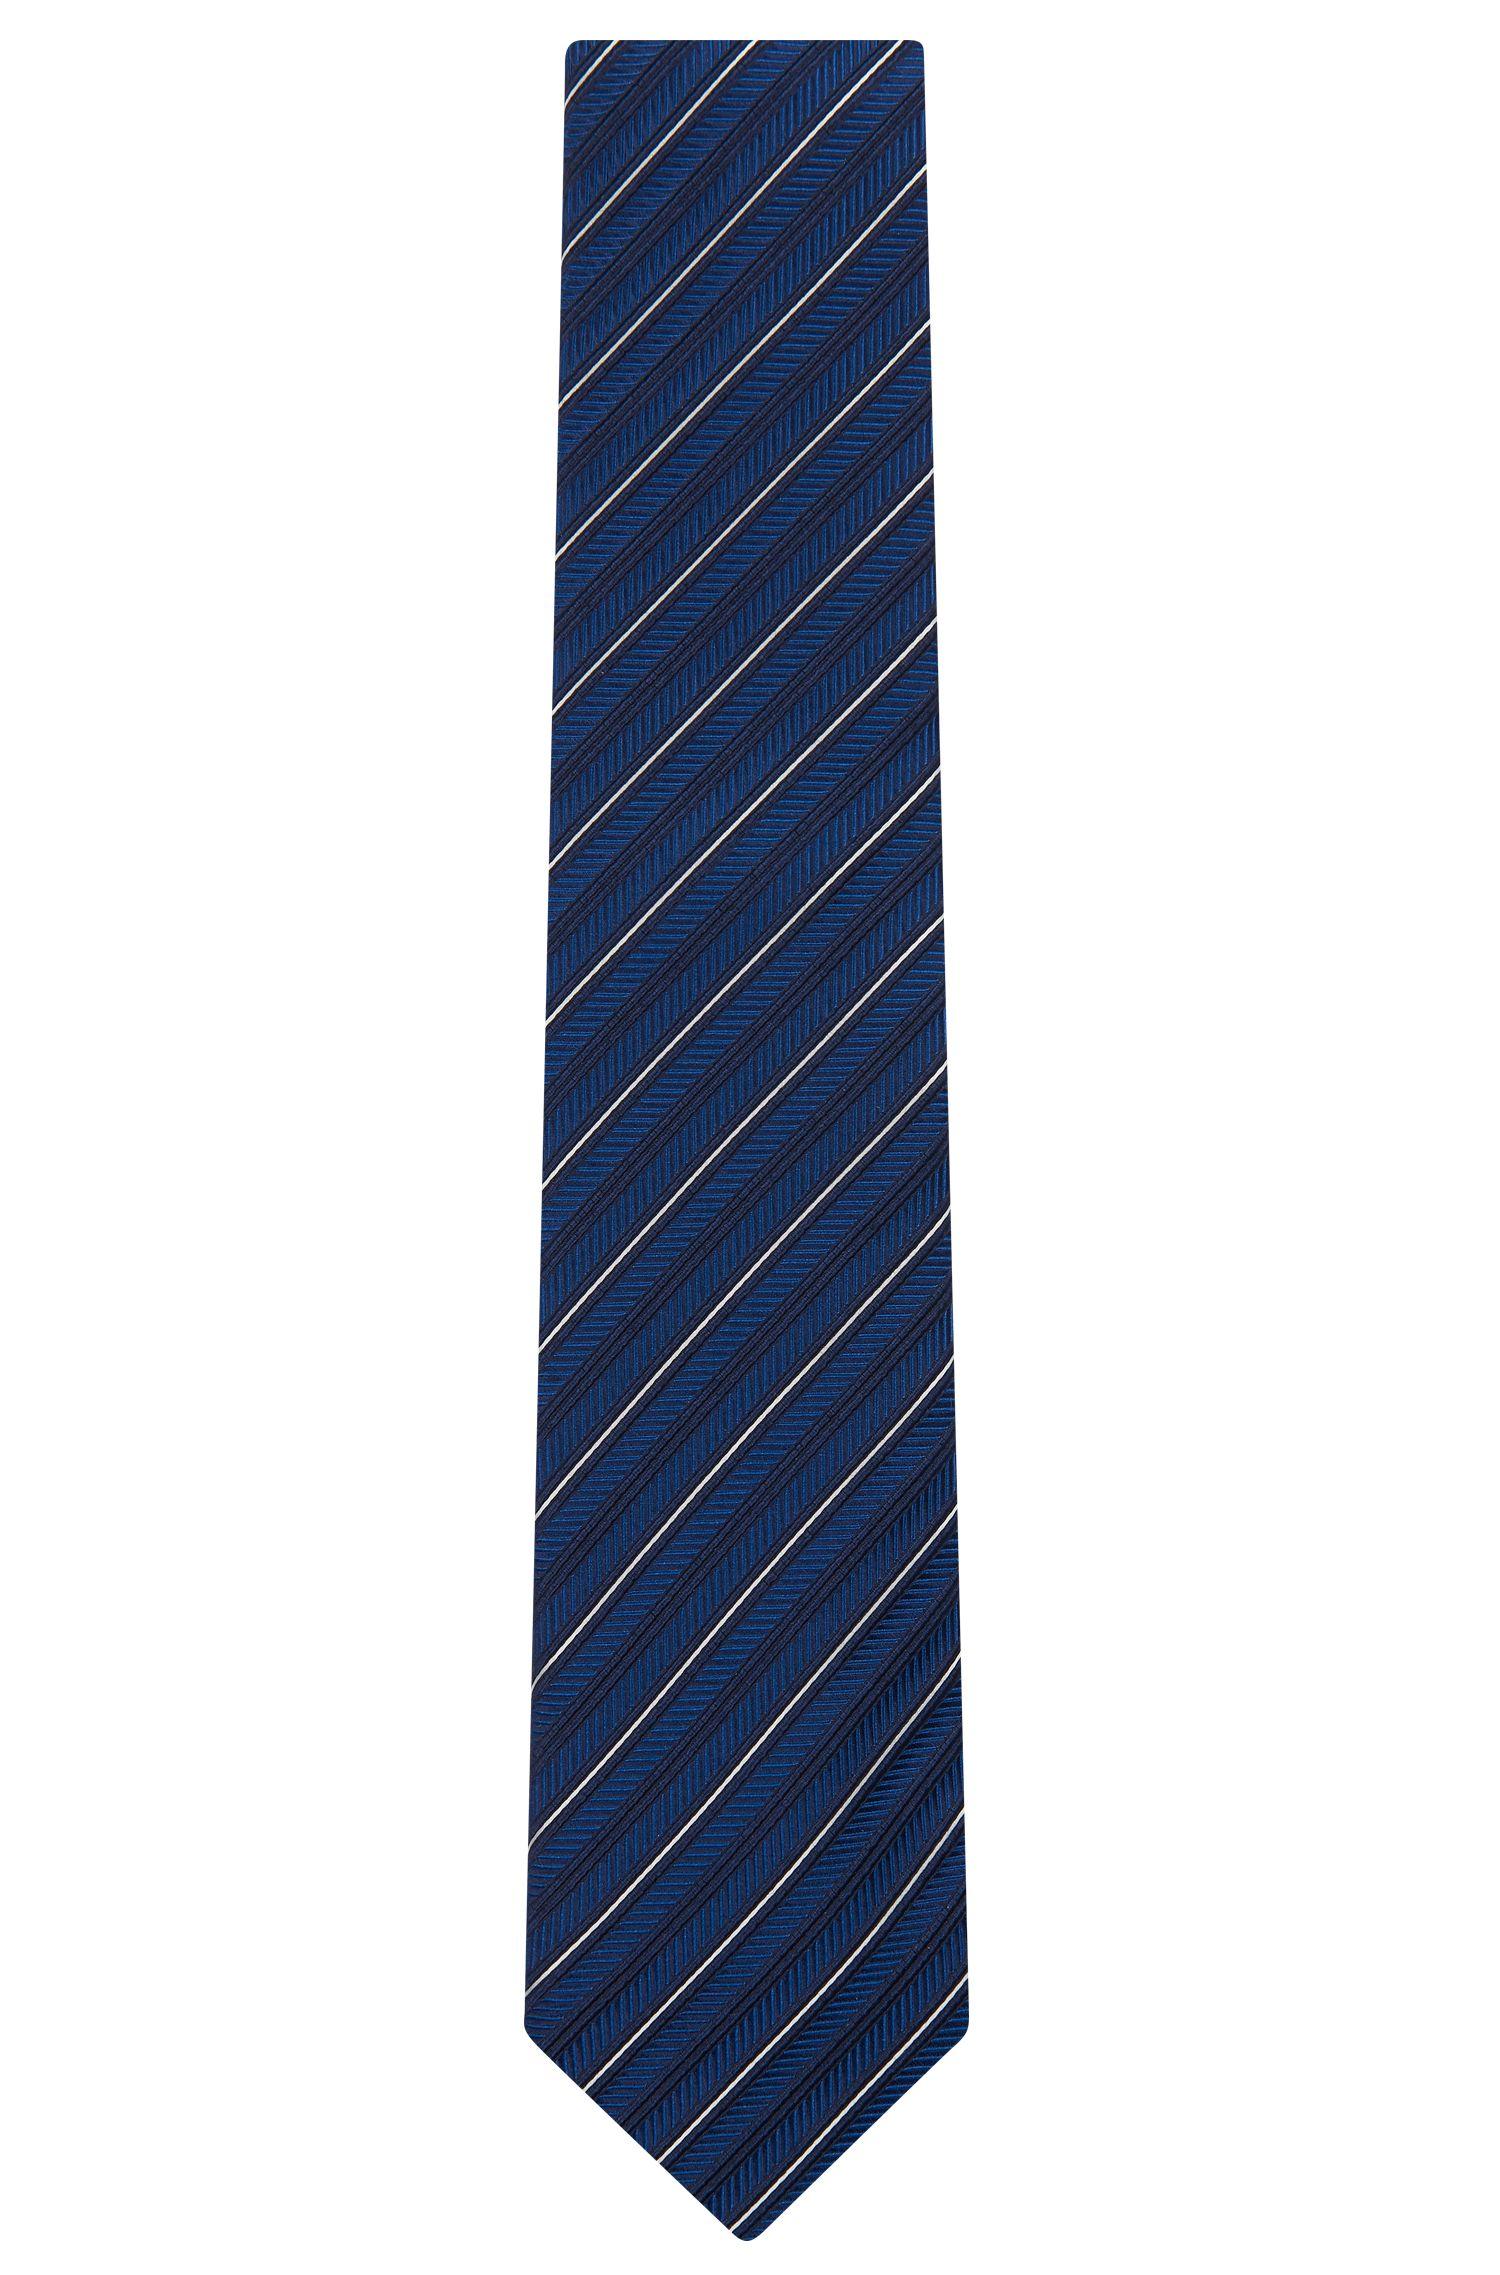 'Tie 7.5 cm' | Regular, Silk Patterned Tie